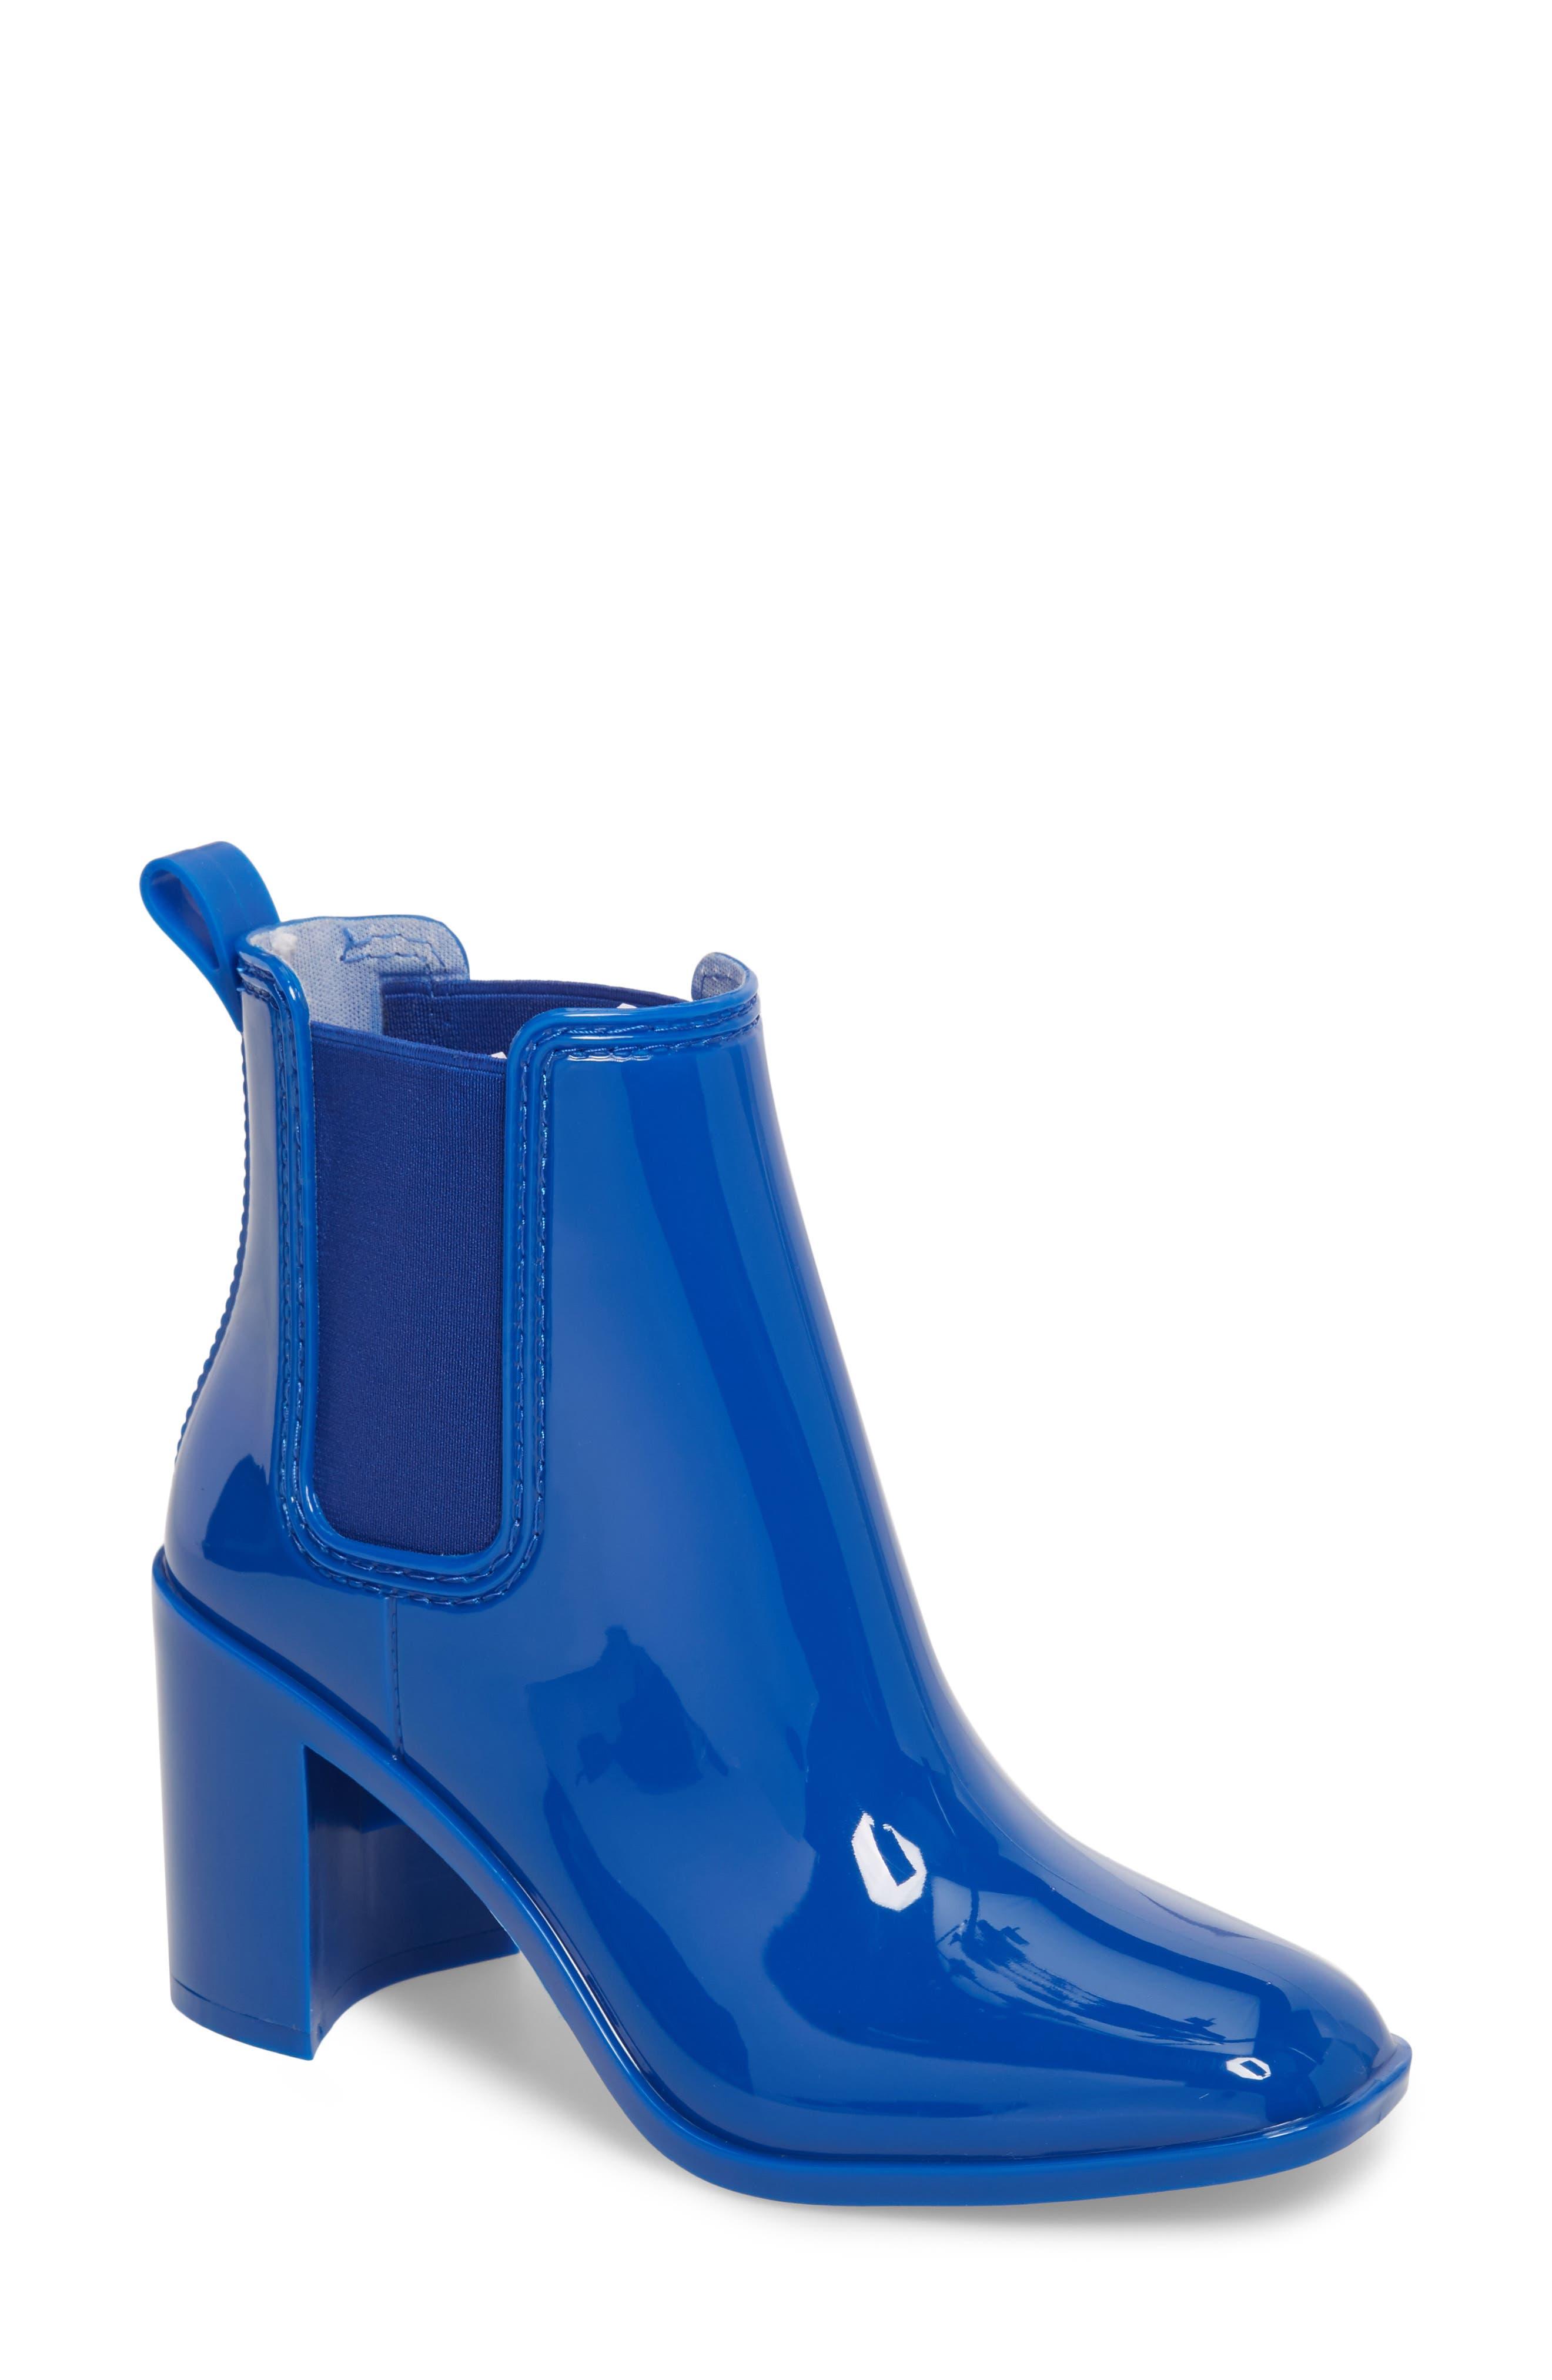 Jeffrey Campbell Hurricane Waterproof Boot, Blue